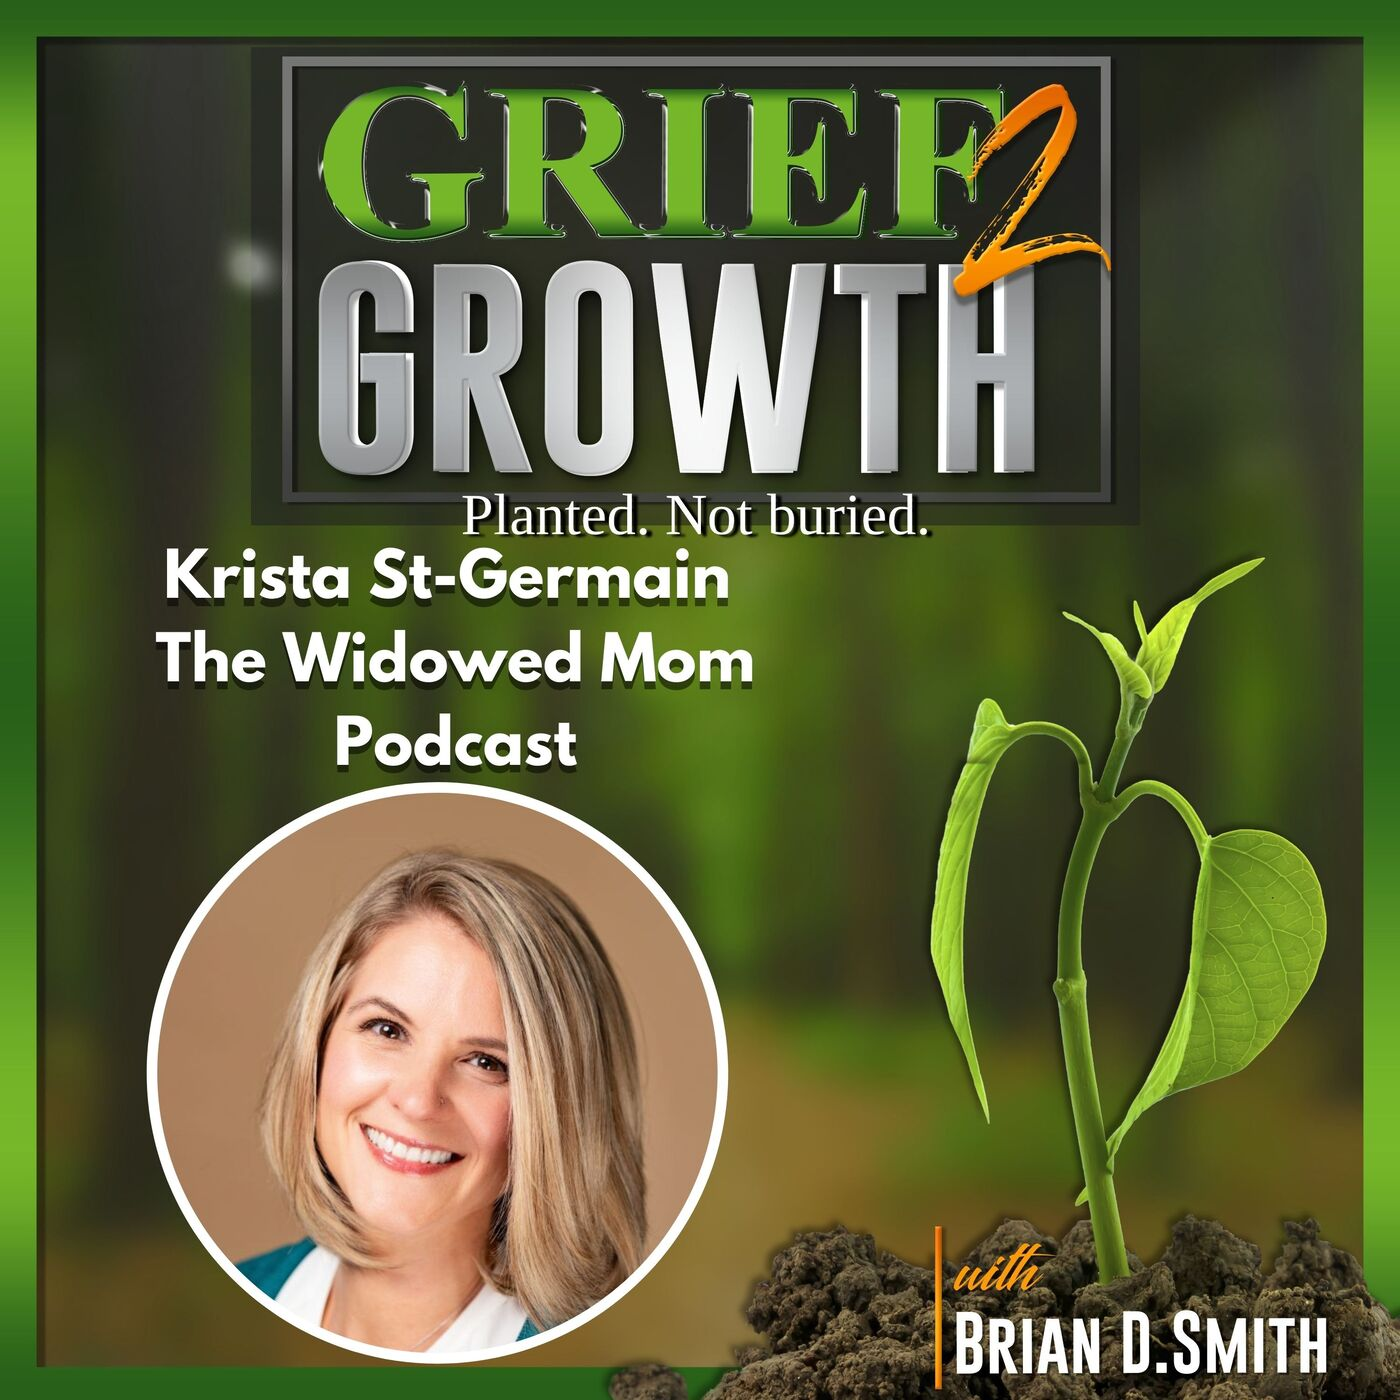 Krista St-Germain- The Widowed Mom Podcast